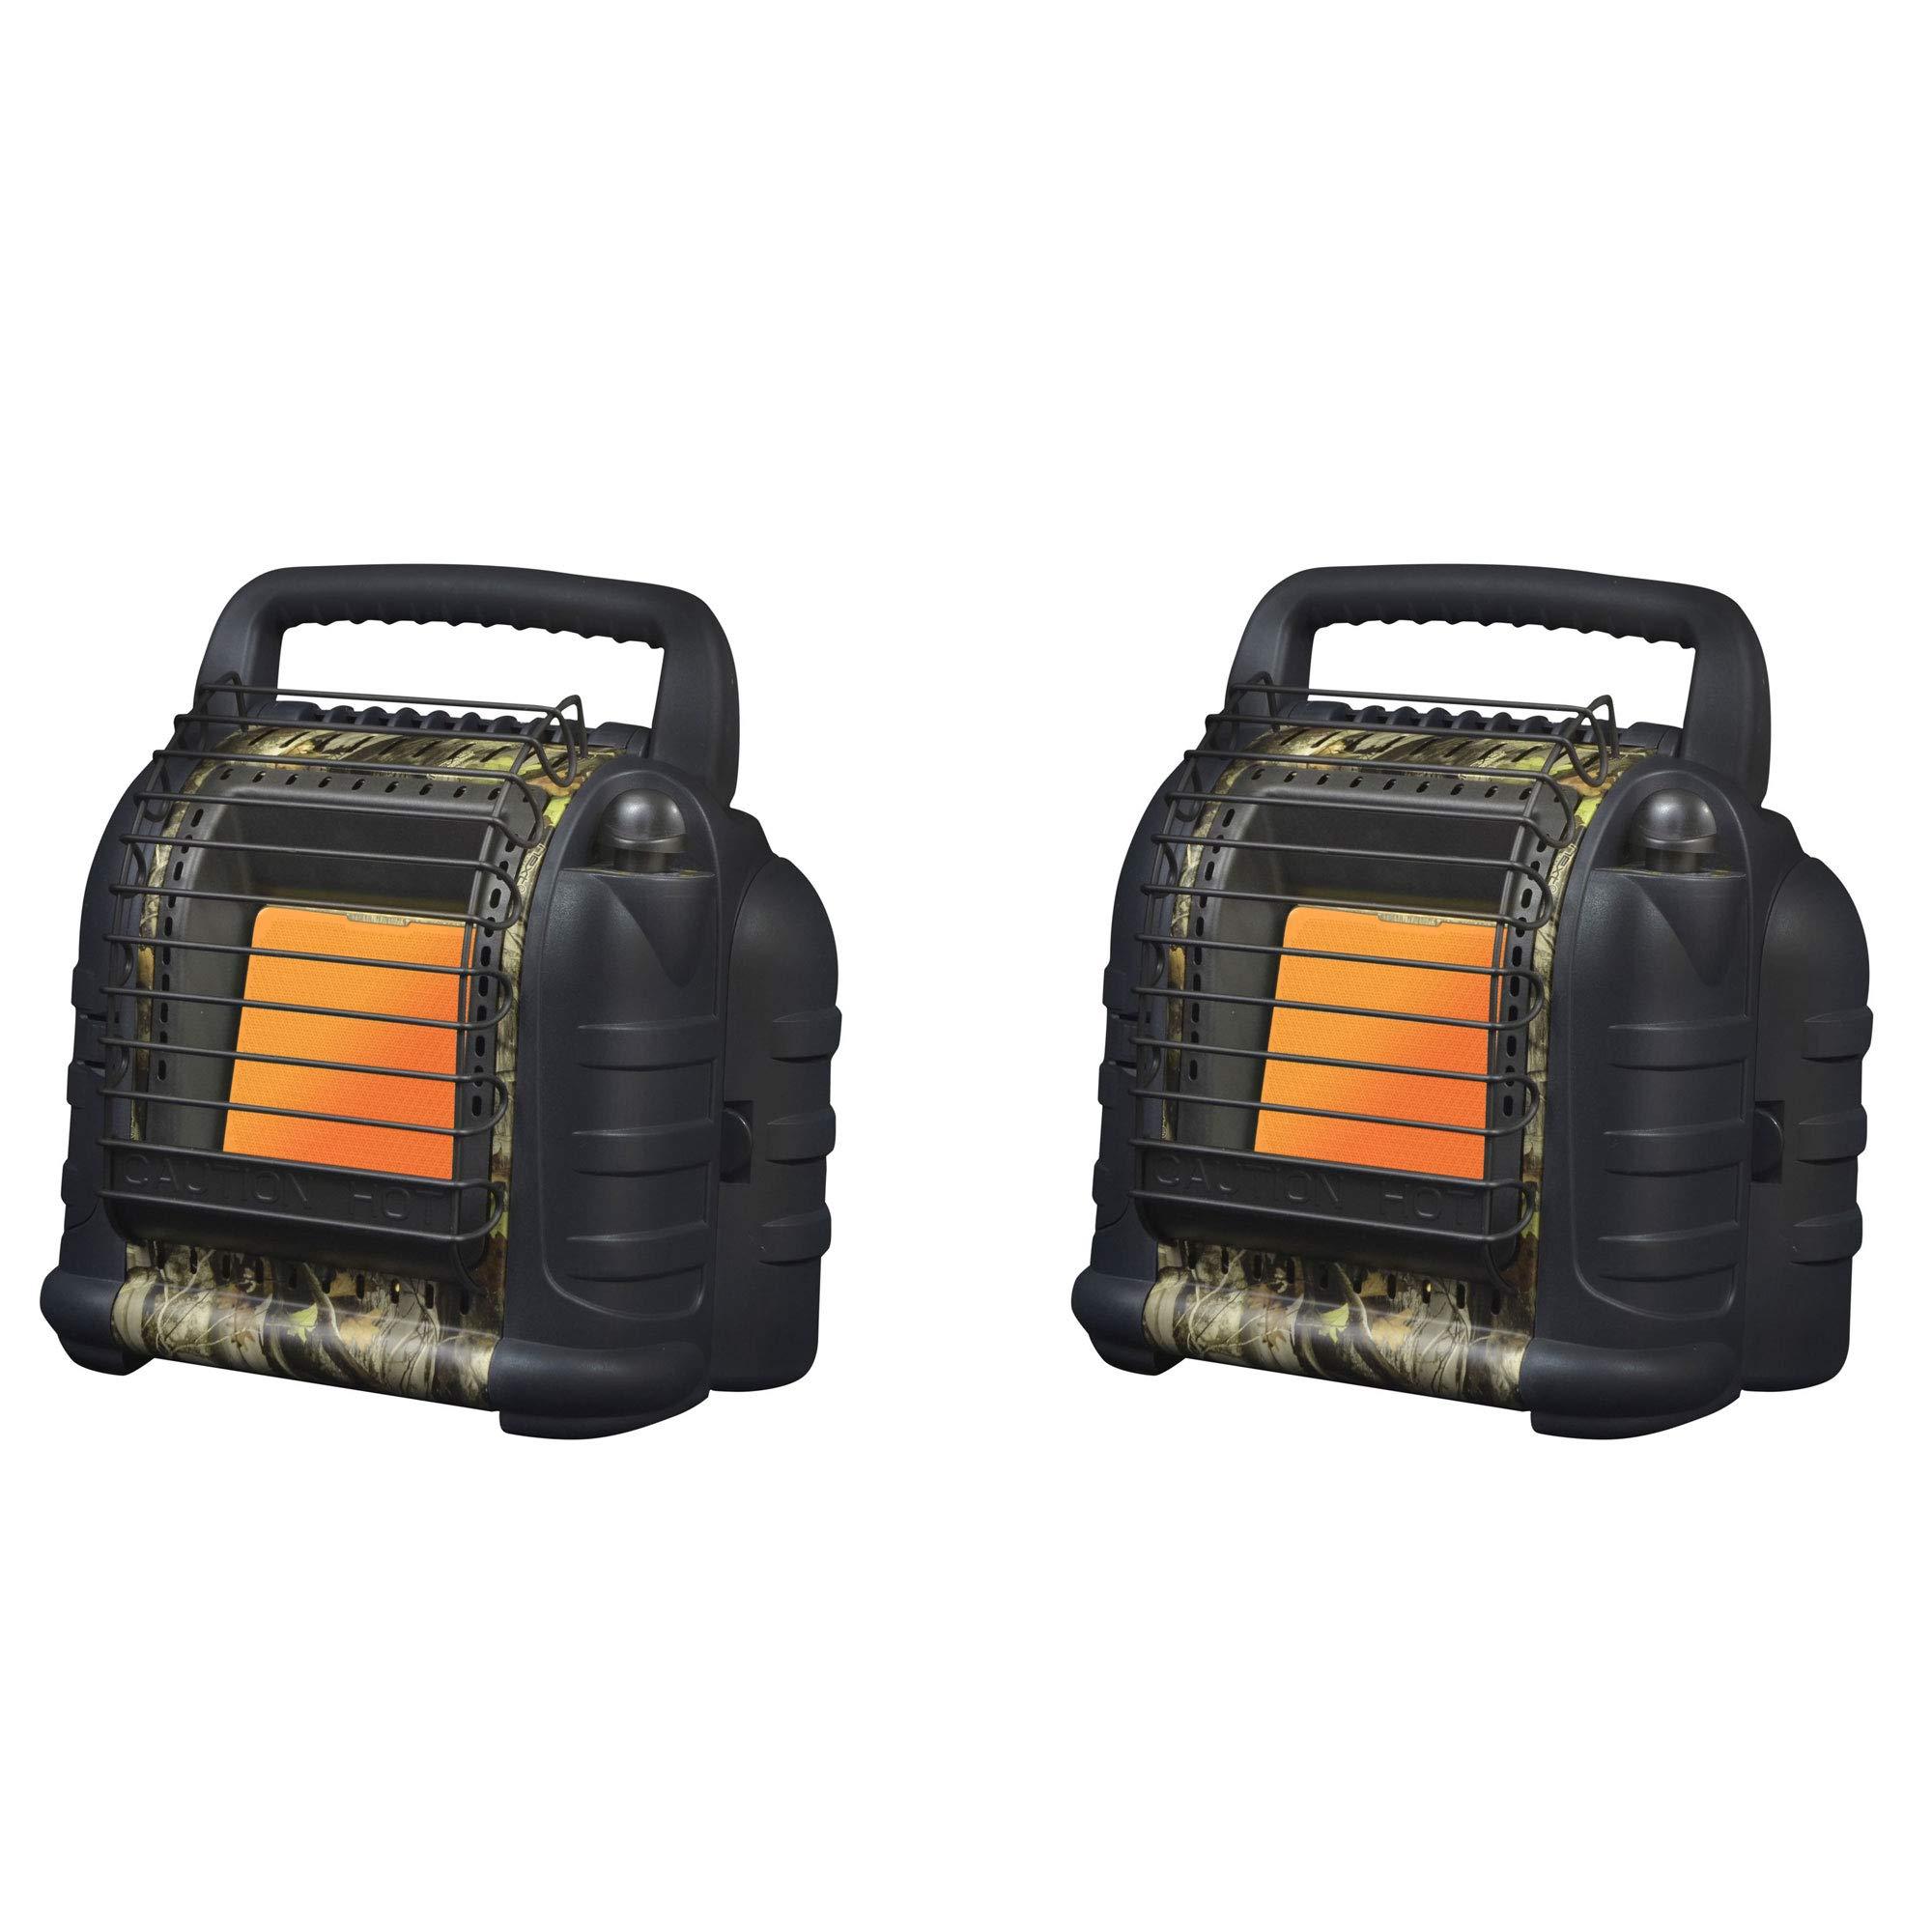 Mr Heater MH12B 12000 BTU Hunting Buddy Portable Propane Heater, Camo (2 Pack) by Mr. Heater